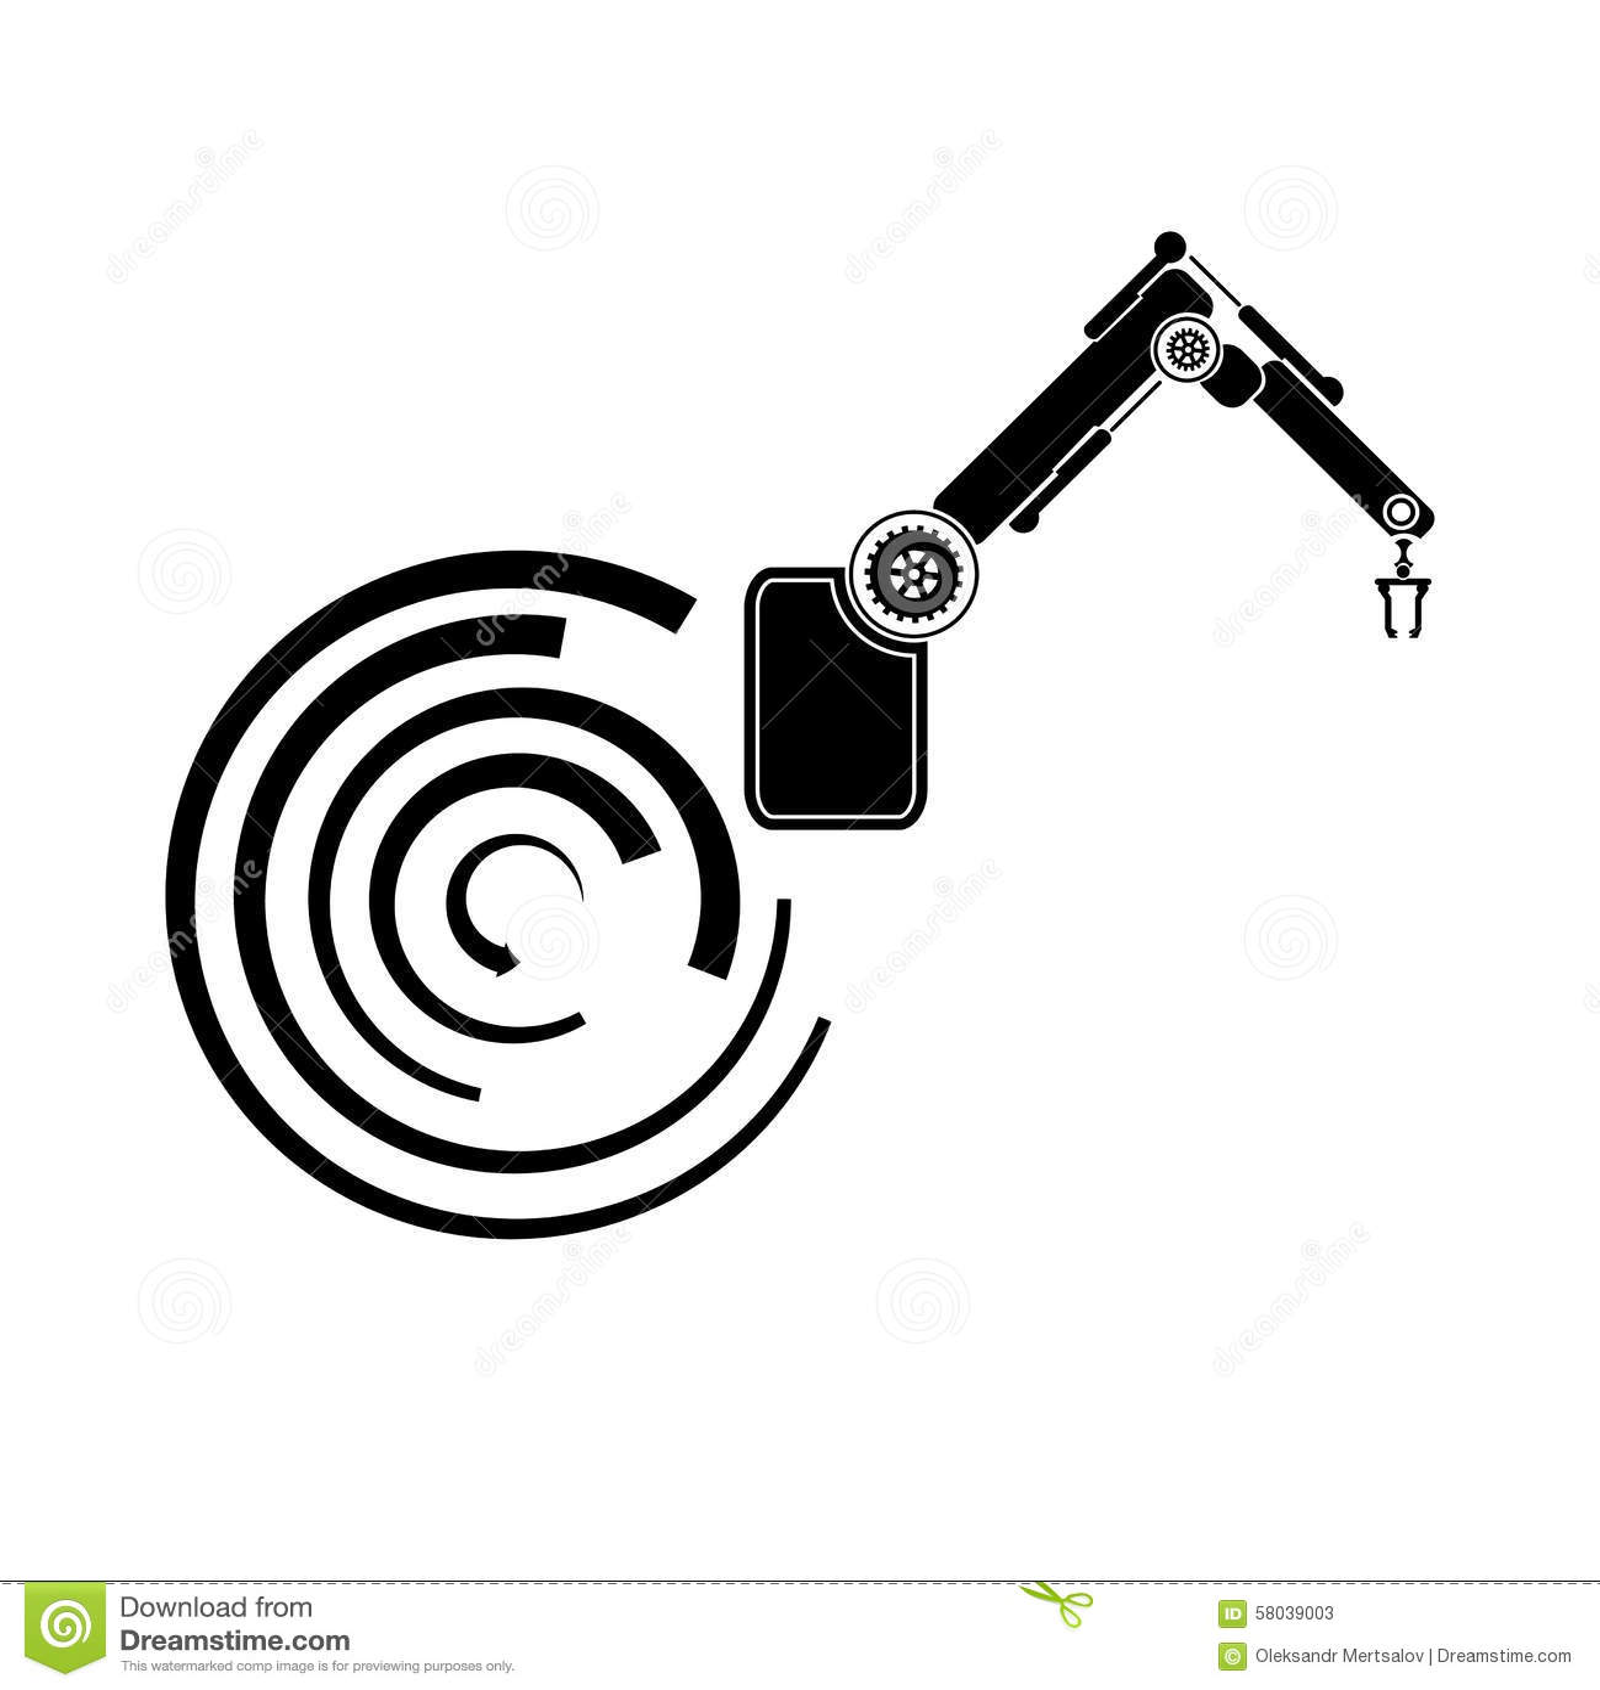 Backgrounds Abstract Vector Robotics Robot Hand Robot Icon Stock